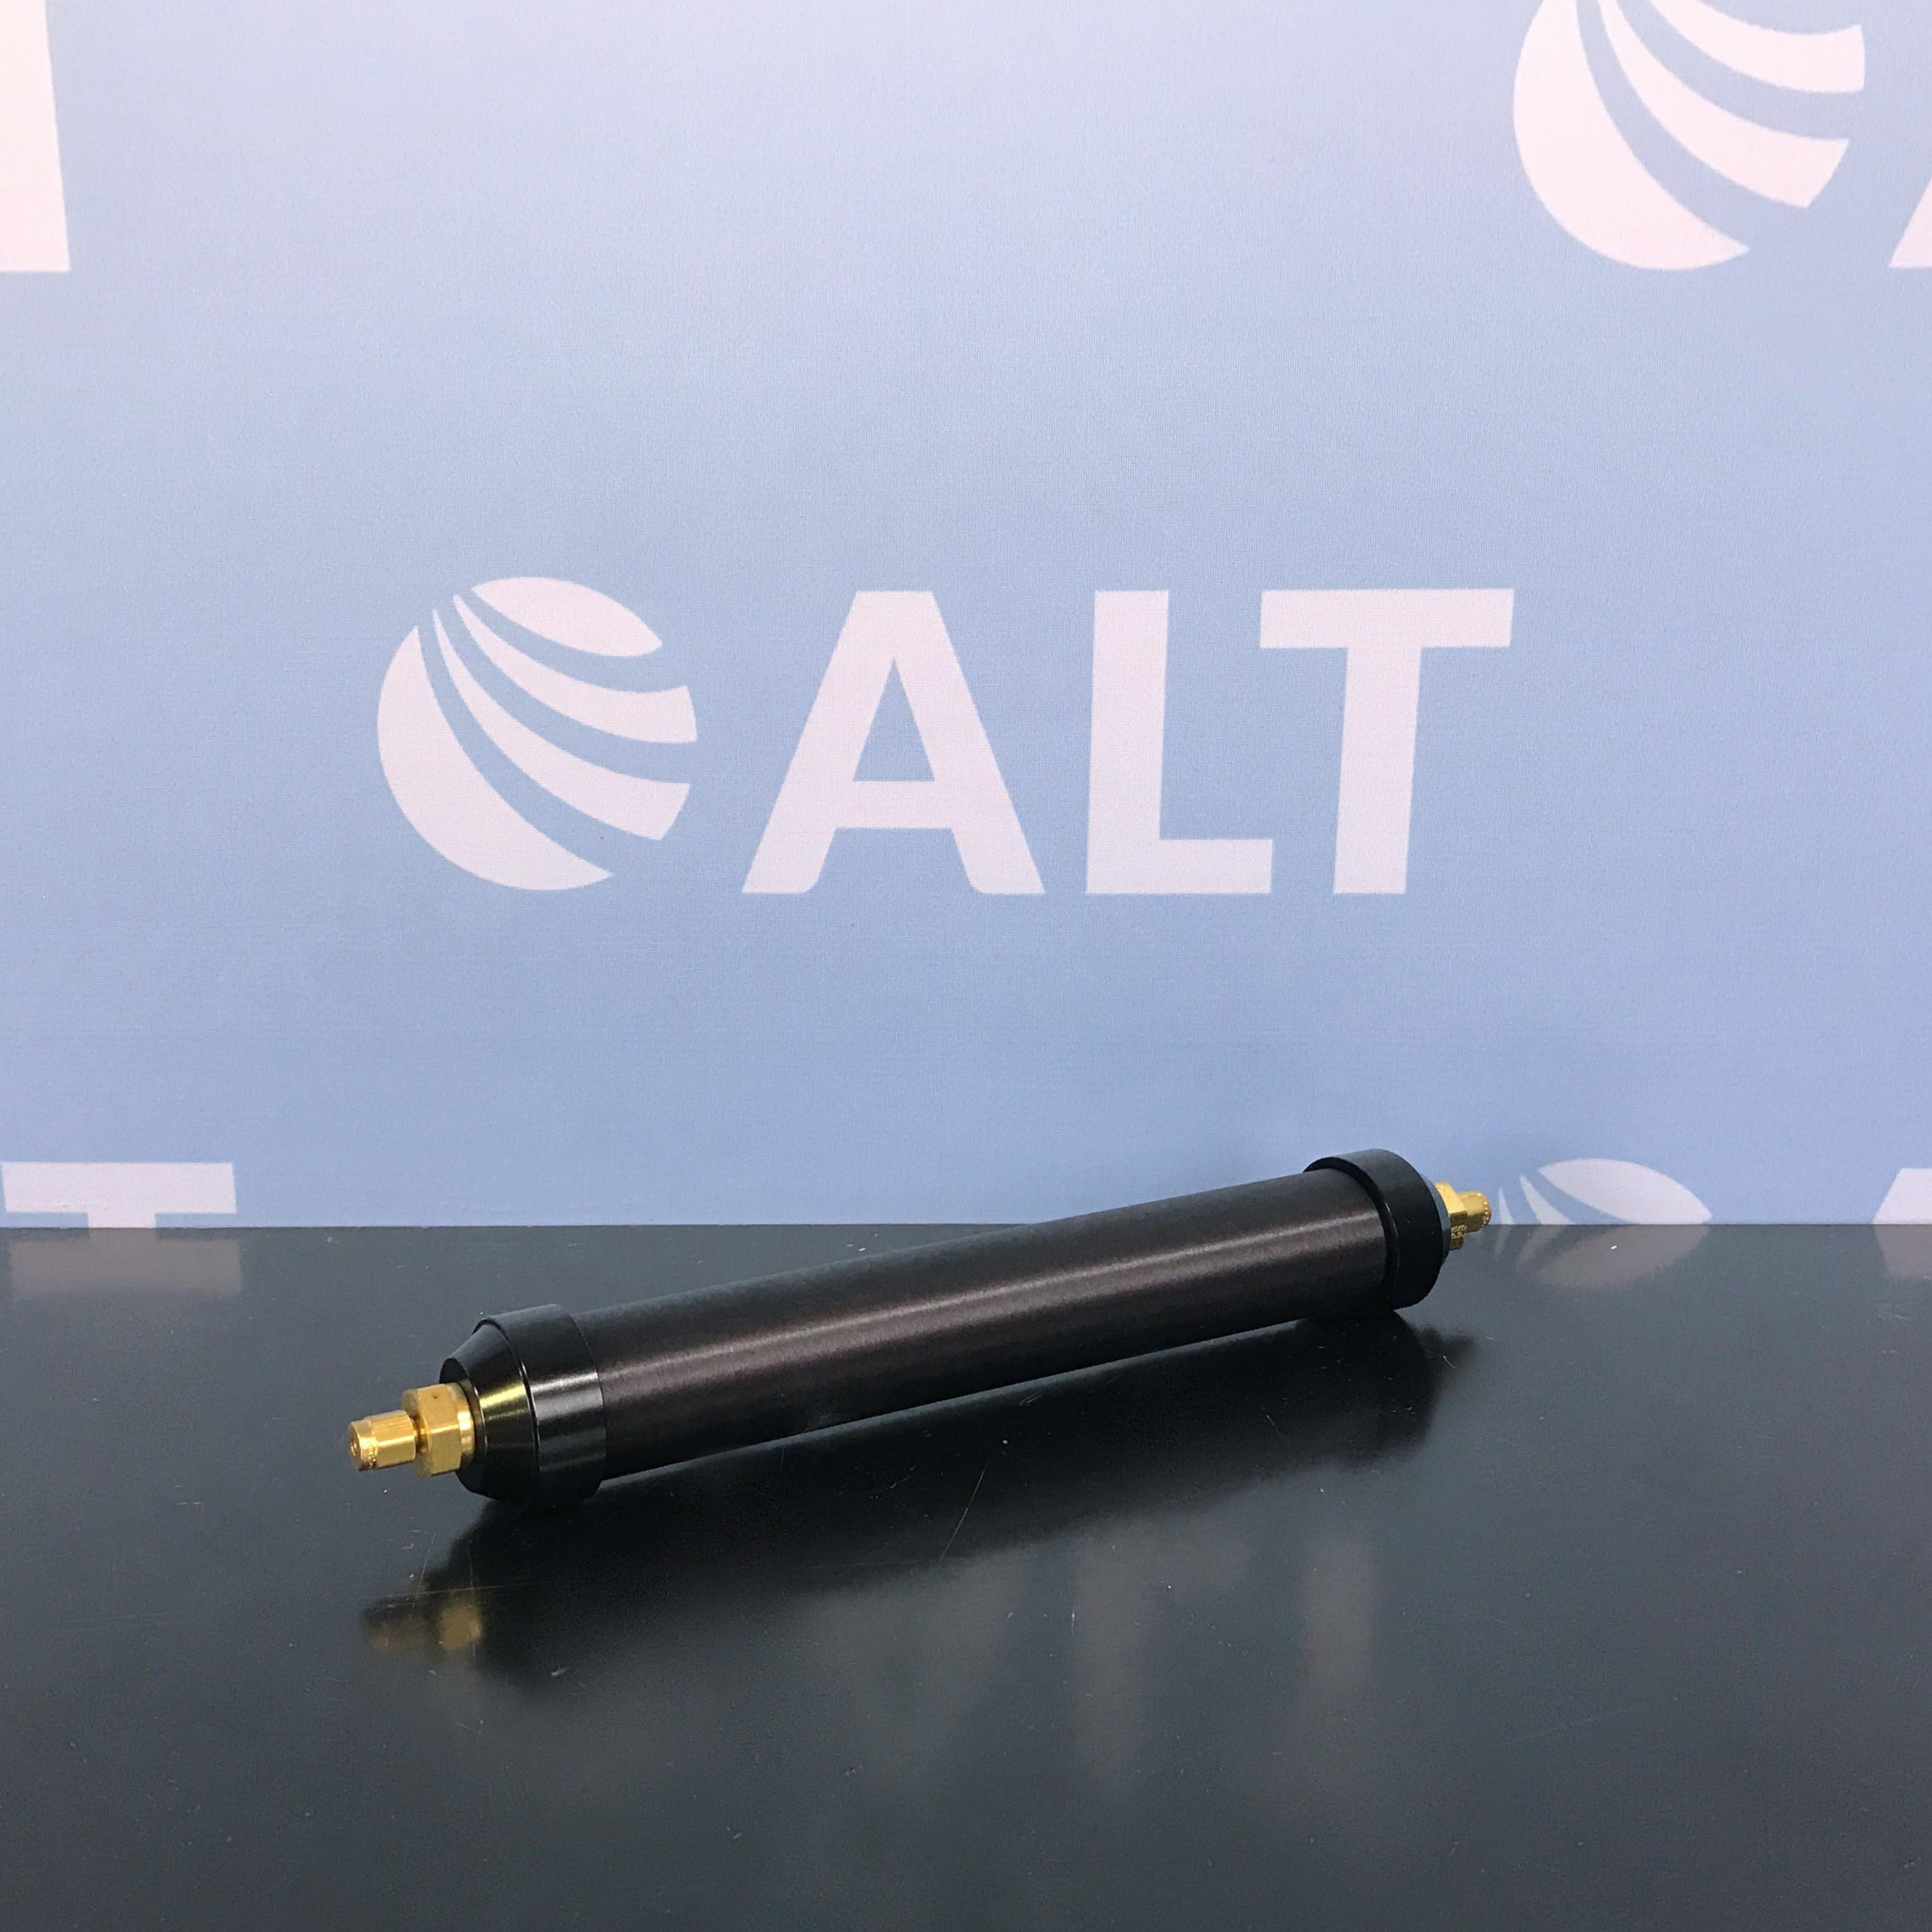 Agilent Technologies HT200-2 Trap, Hydrocarbon, 1/8 in, 200 cc Image